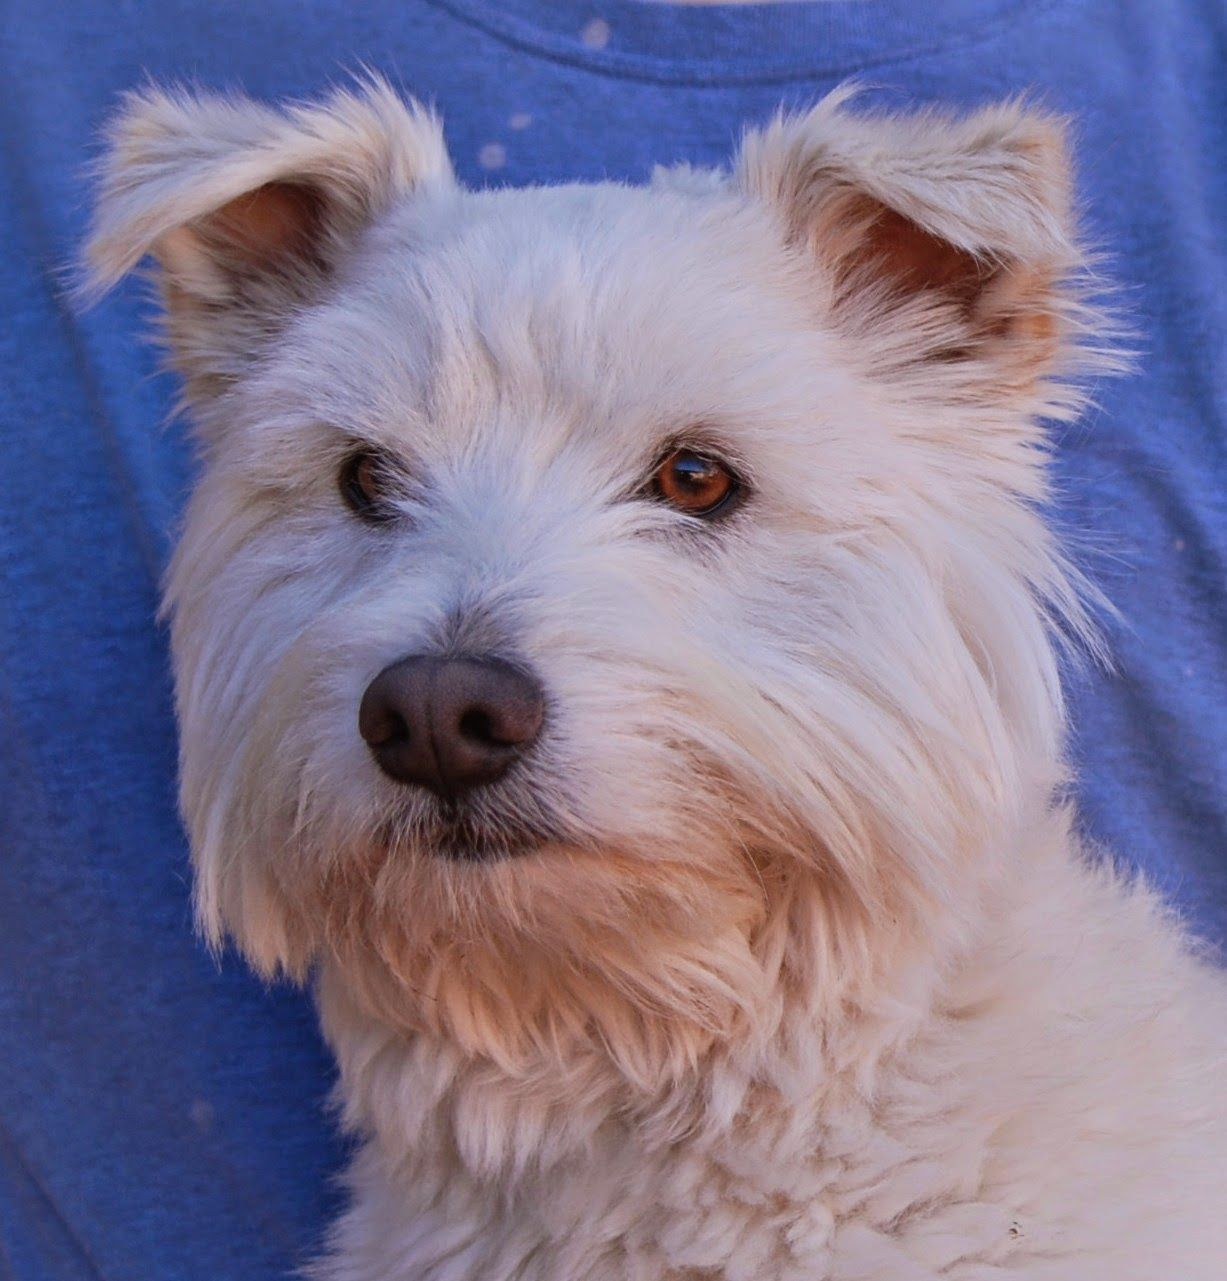 Nevada Spca Animal Rescue Dogs Schnauzer Mix Tibetan Terrier